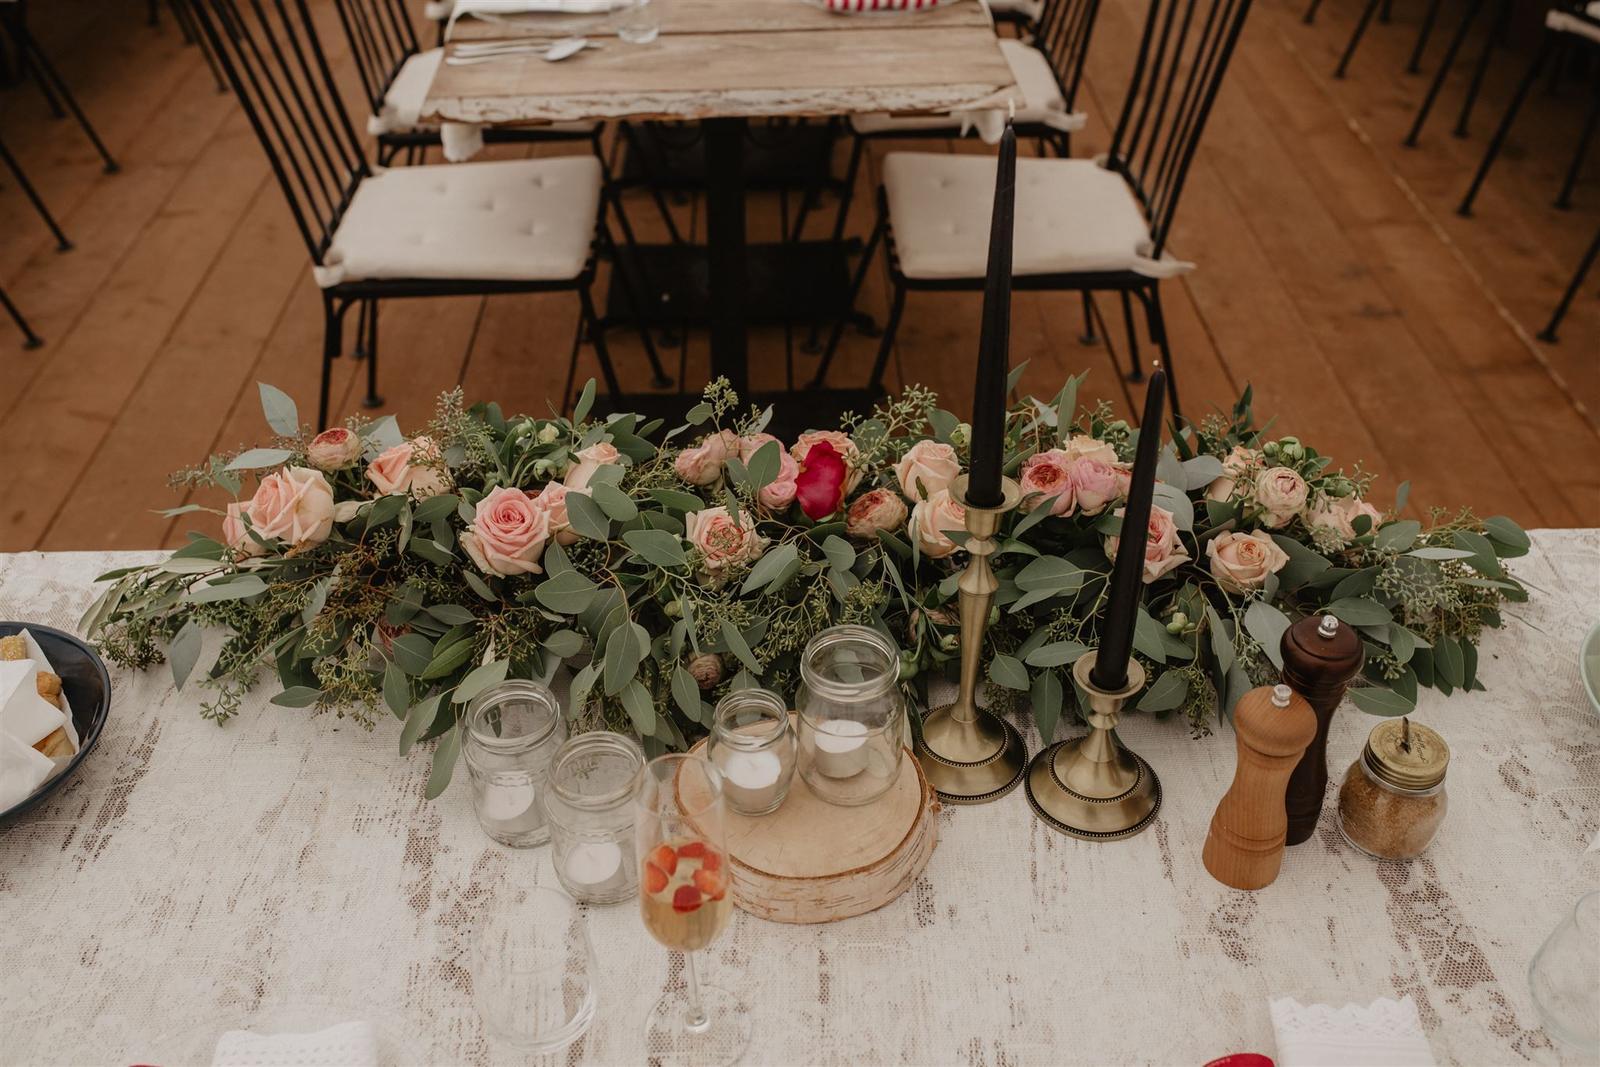 Krásna a romantická svadobná party v záhrade reštaurácie Bistra Dukát - Le Gout v srdci B. Bystrice. - Obrázok č. 6